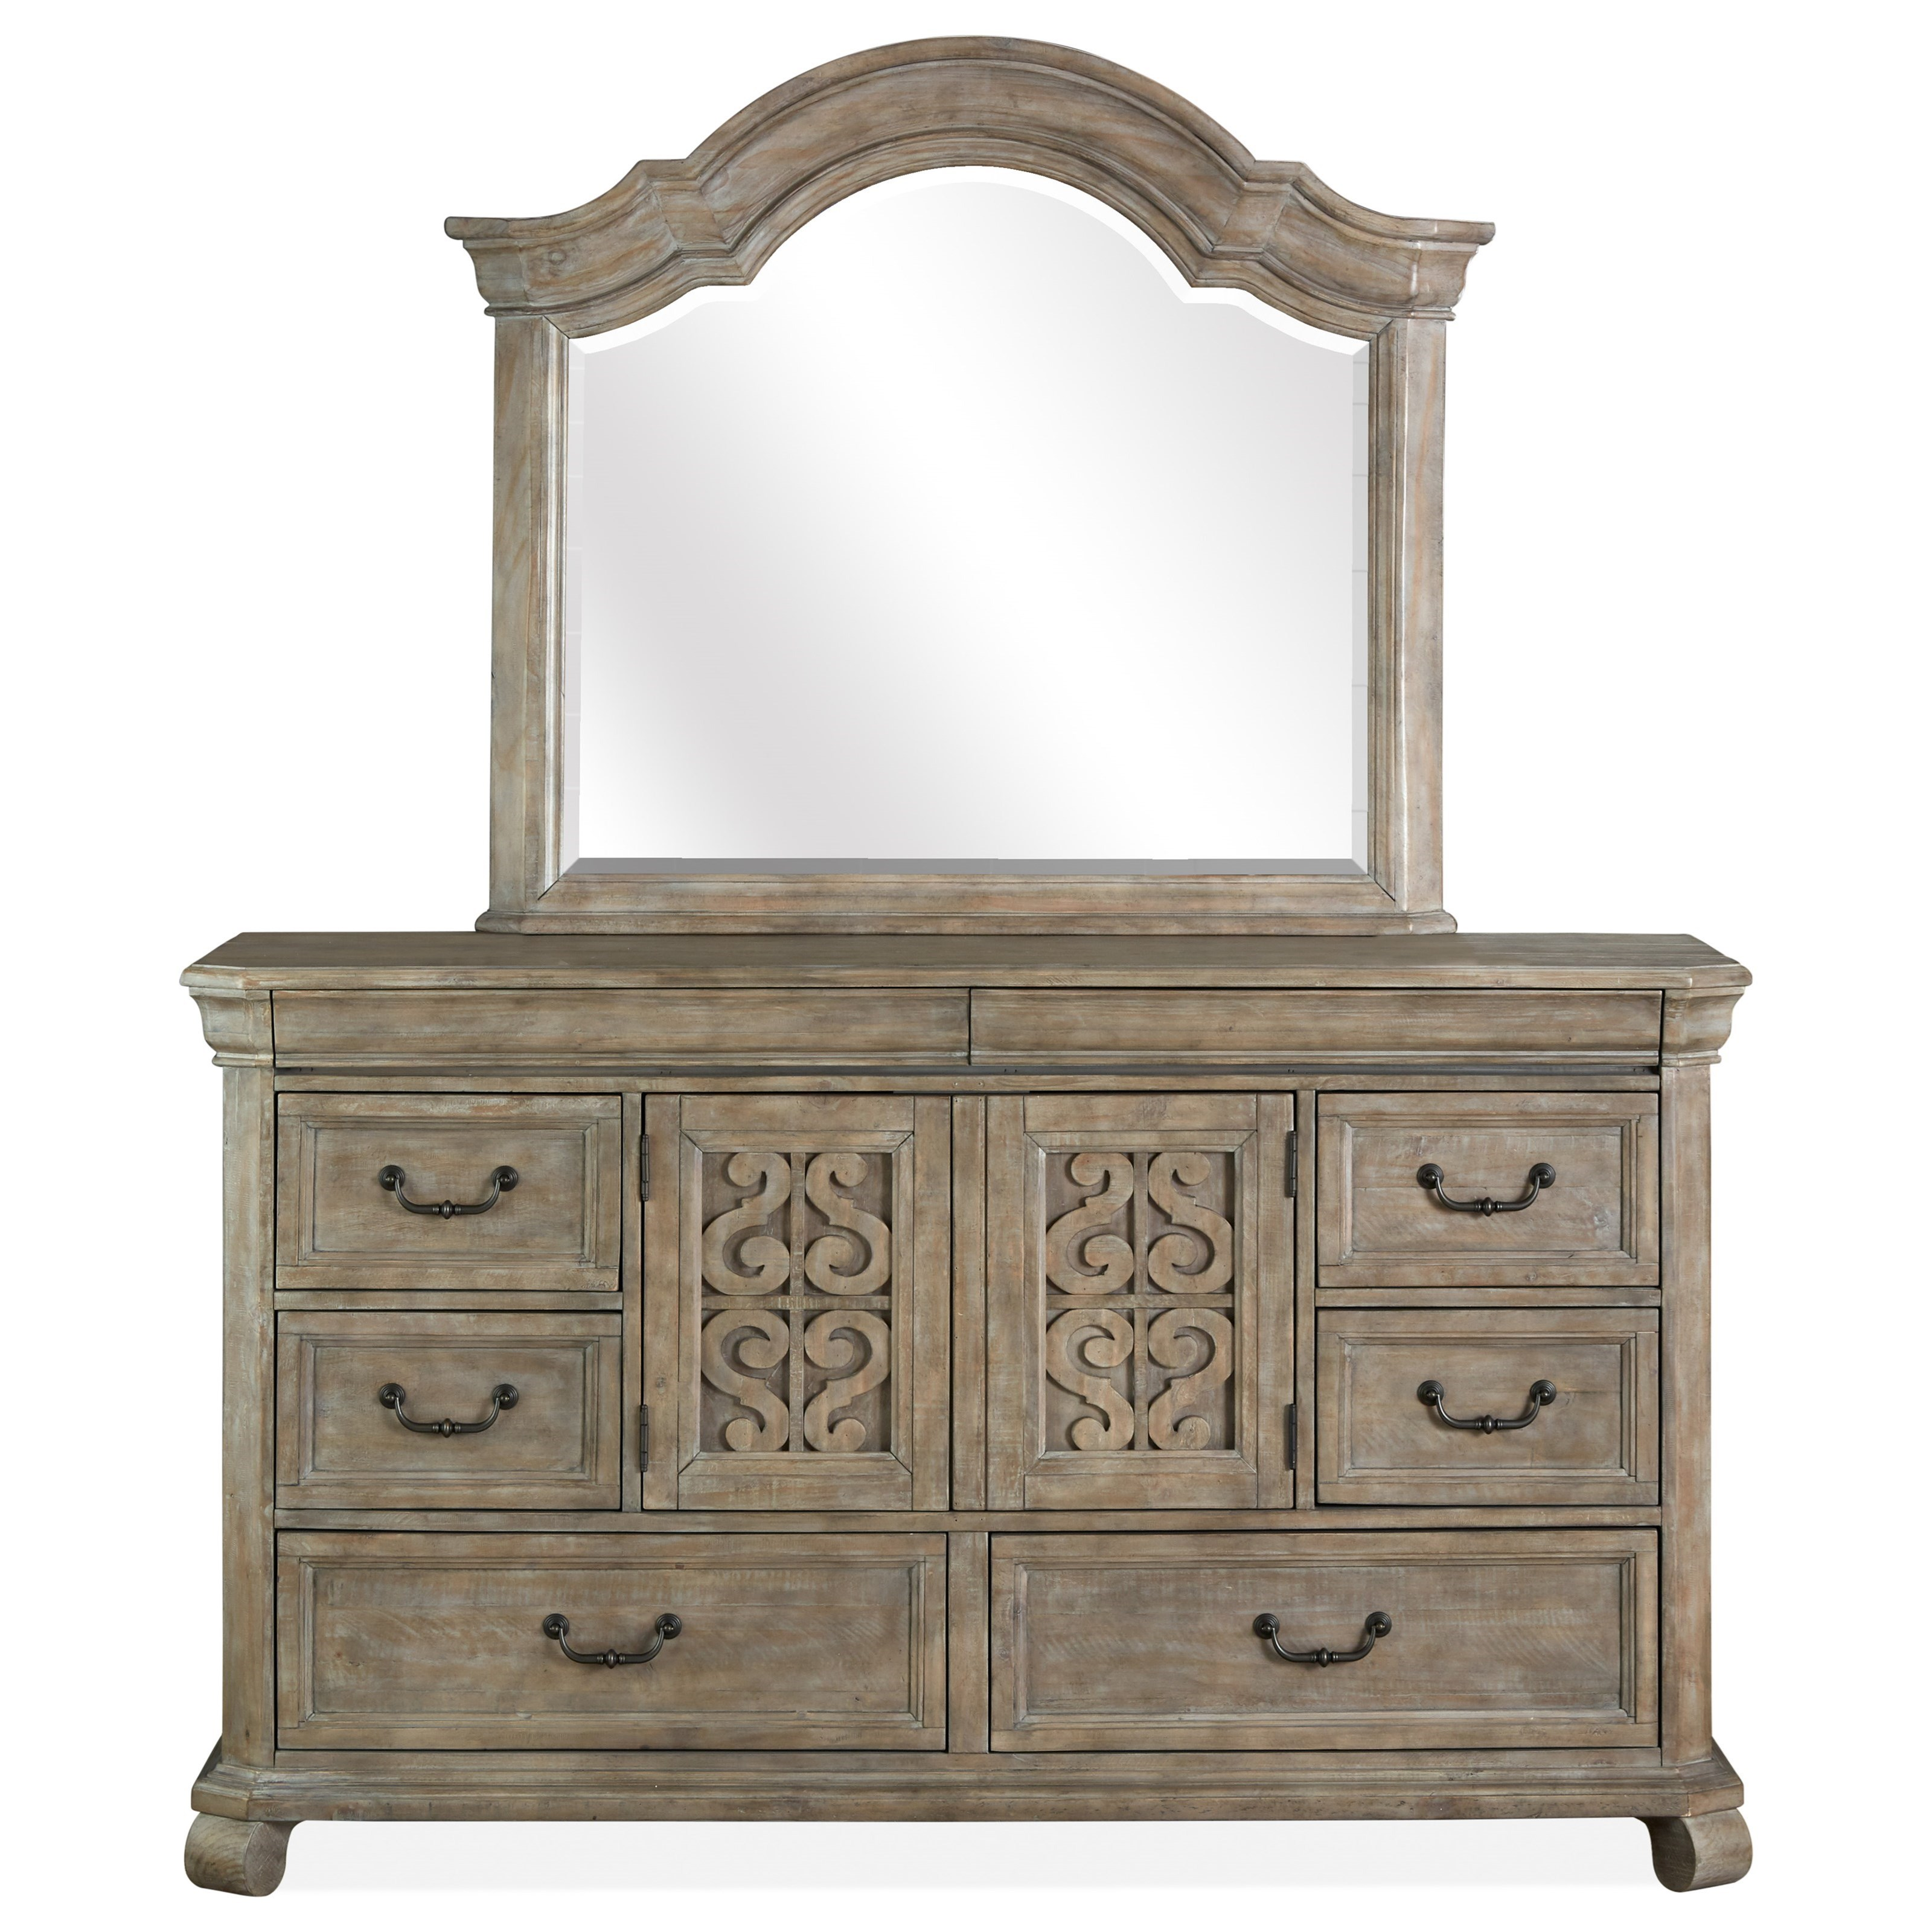 Tinley Park Drawer Dresser & Mirror Set by Magnussen Home at Upper Room Home Furnishings